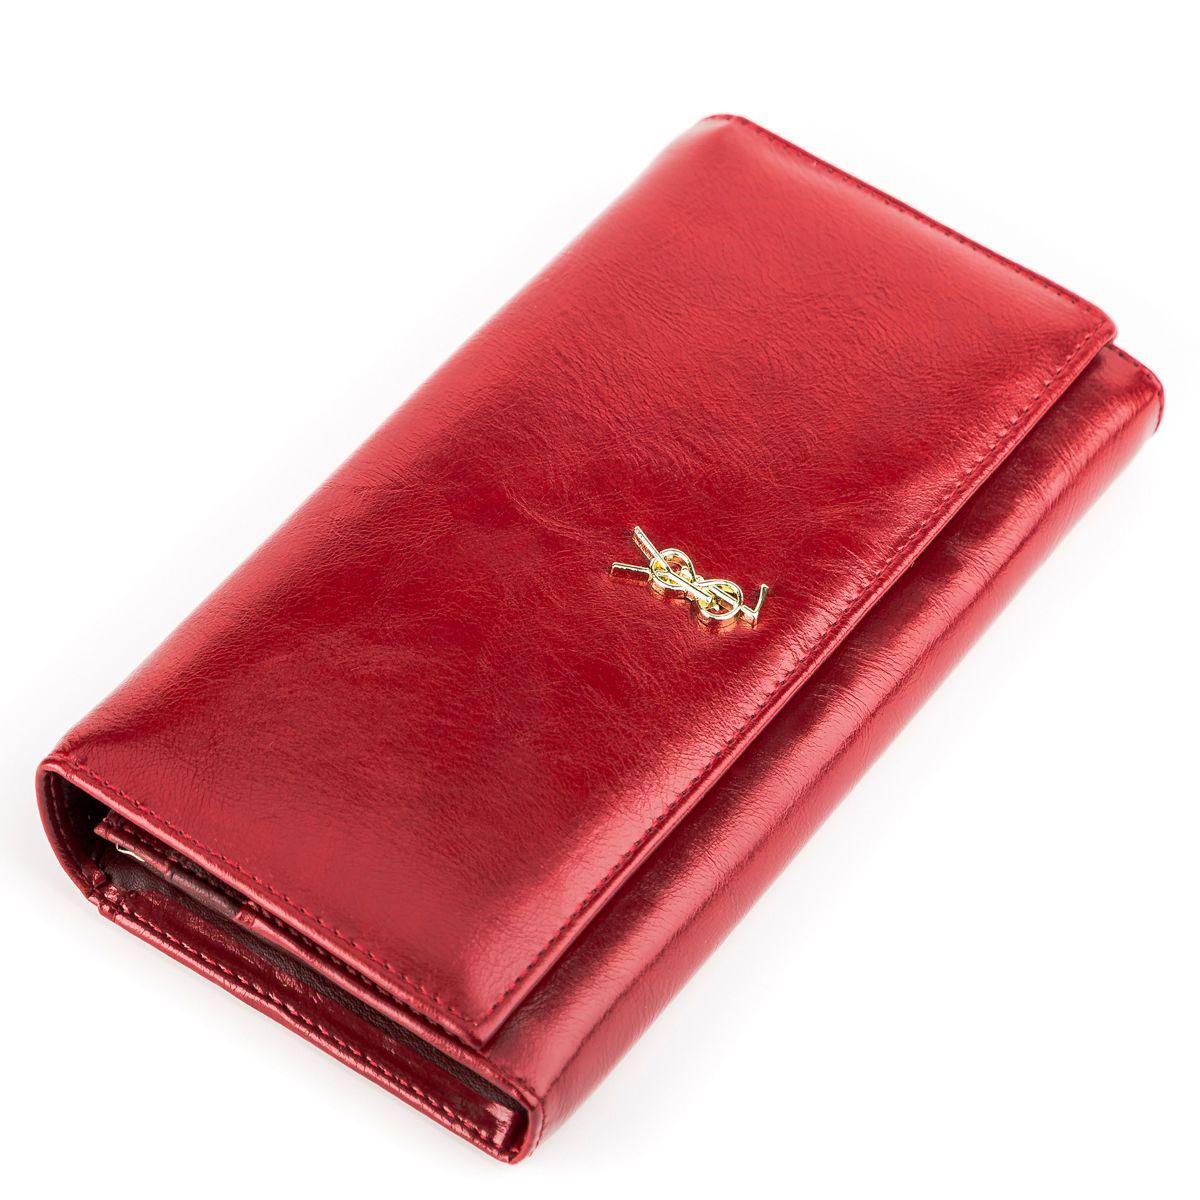 9443d044bbff Кошелек женский BALISA 13855 кожаный Красный, Красный - купить по ...